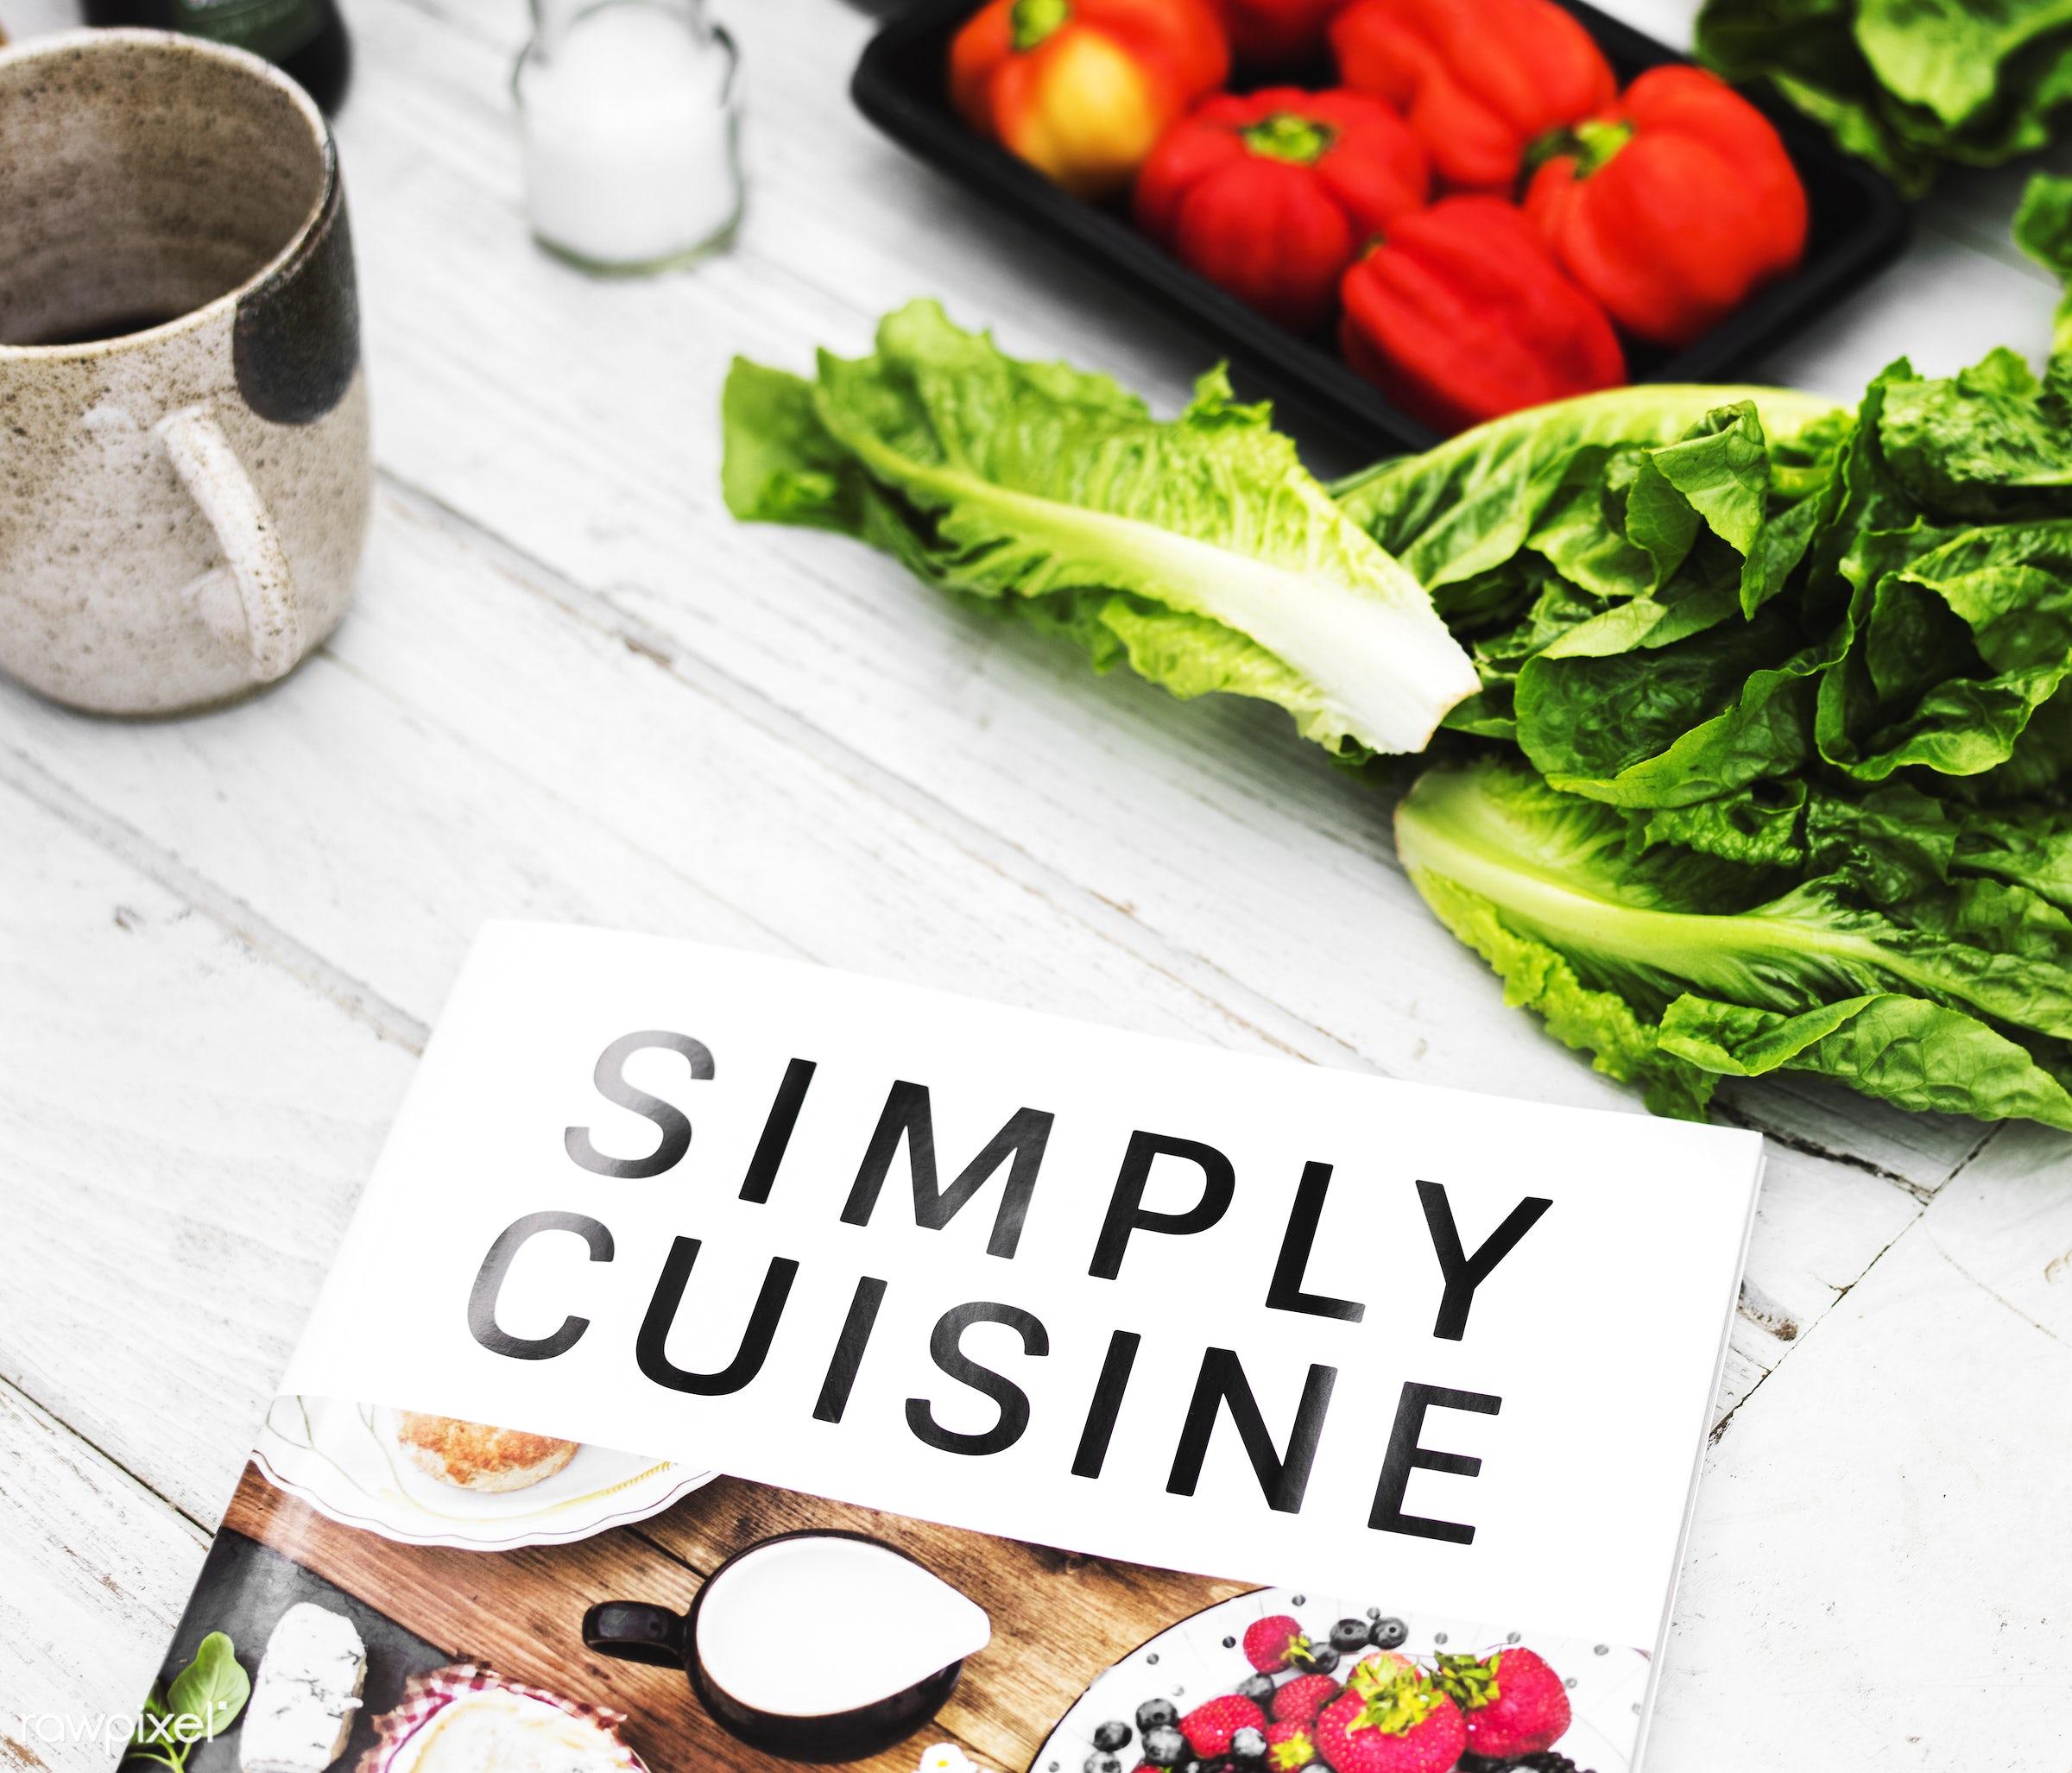 raw, recipe, cuisine, fiber, fresh, ingredient, plate, culinary, veggies, edible, dinner, nutrition, organic, simply, food,...